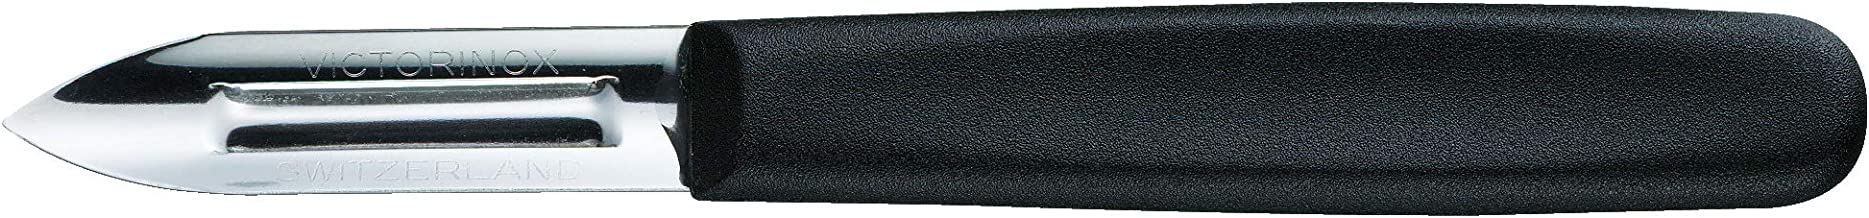 Victorinox 2-1/4-Inch Double Edge Peeler, Black Polypropylene Handle